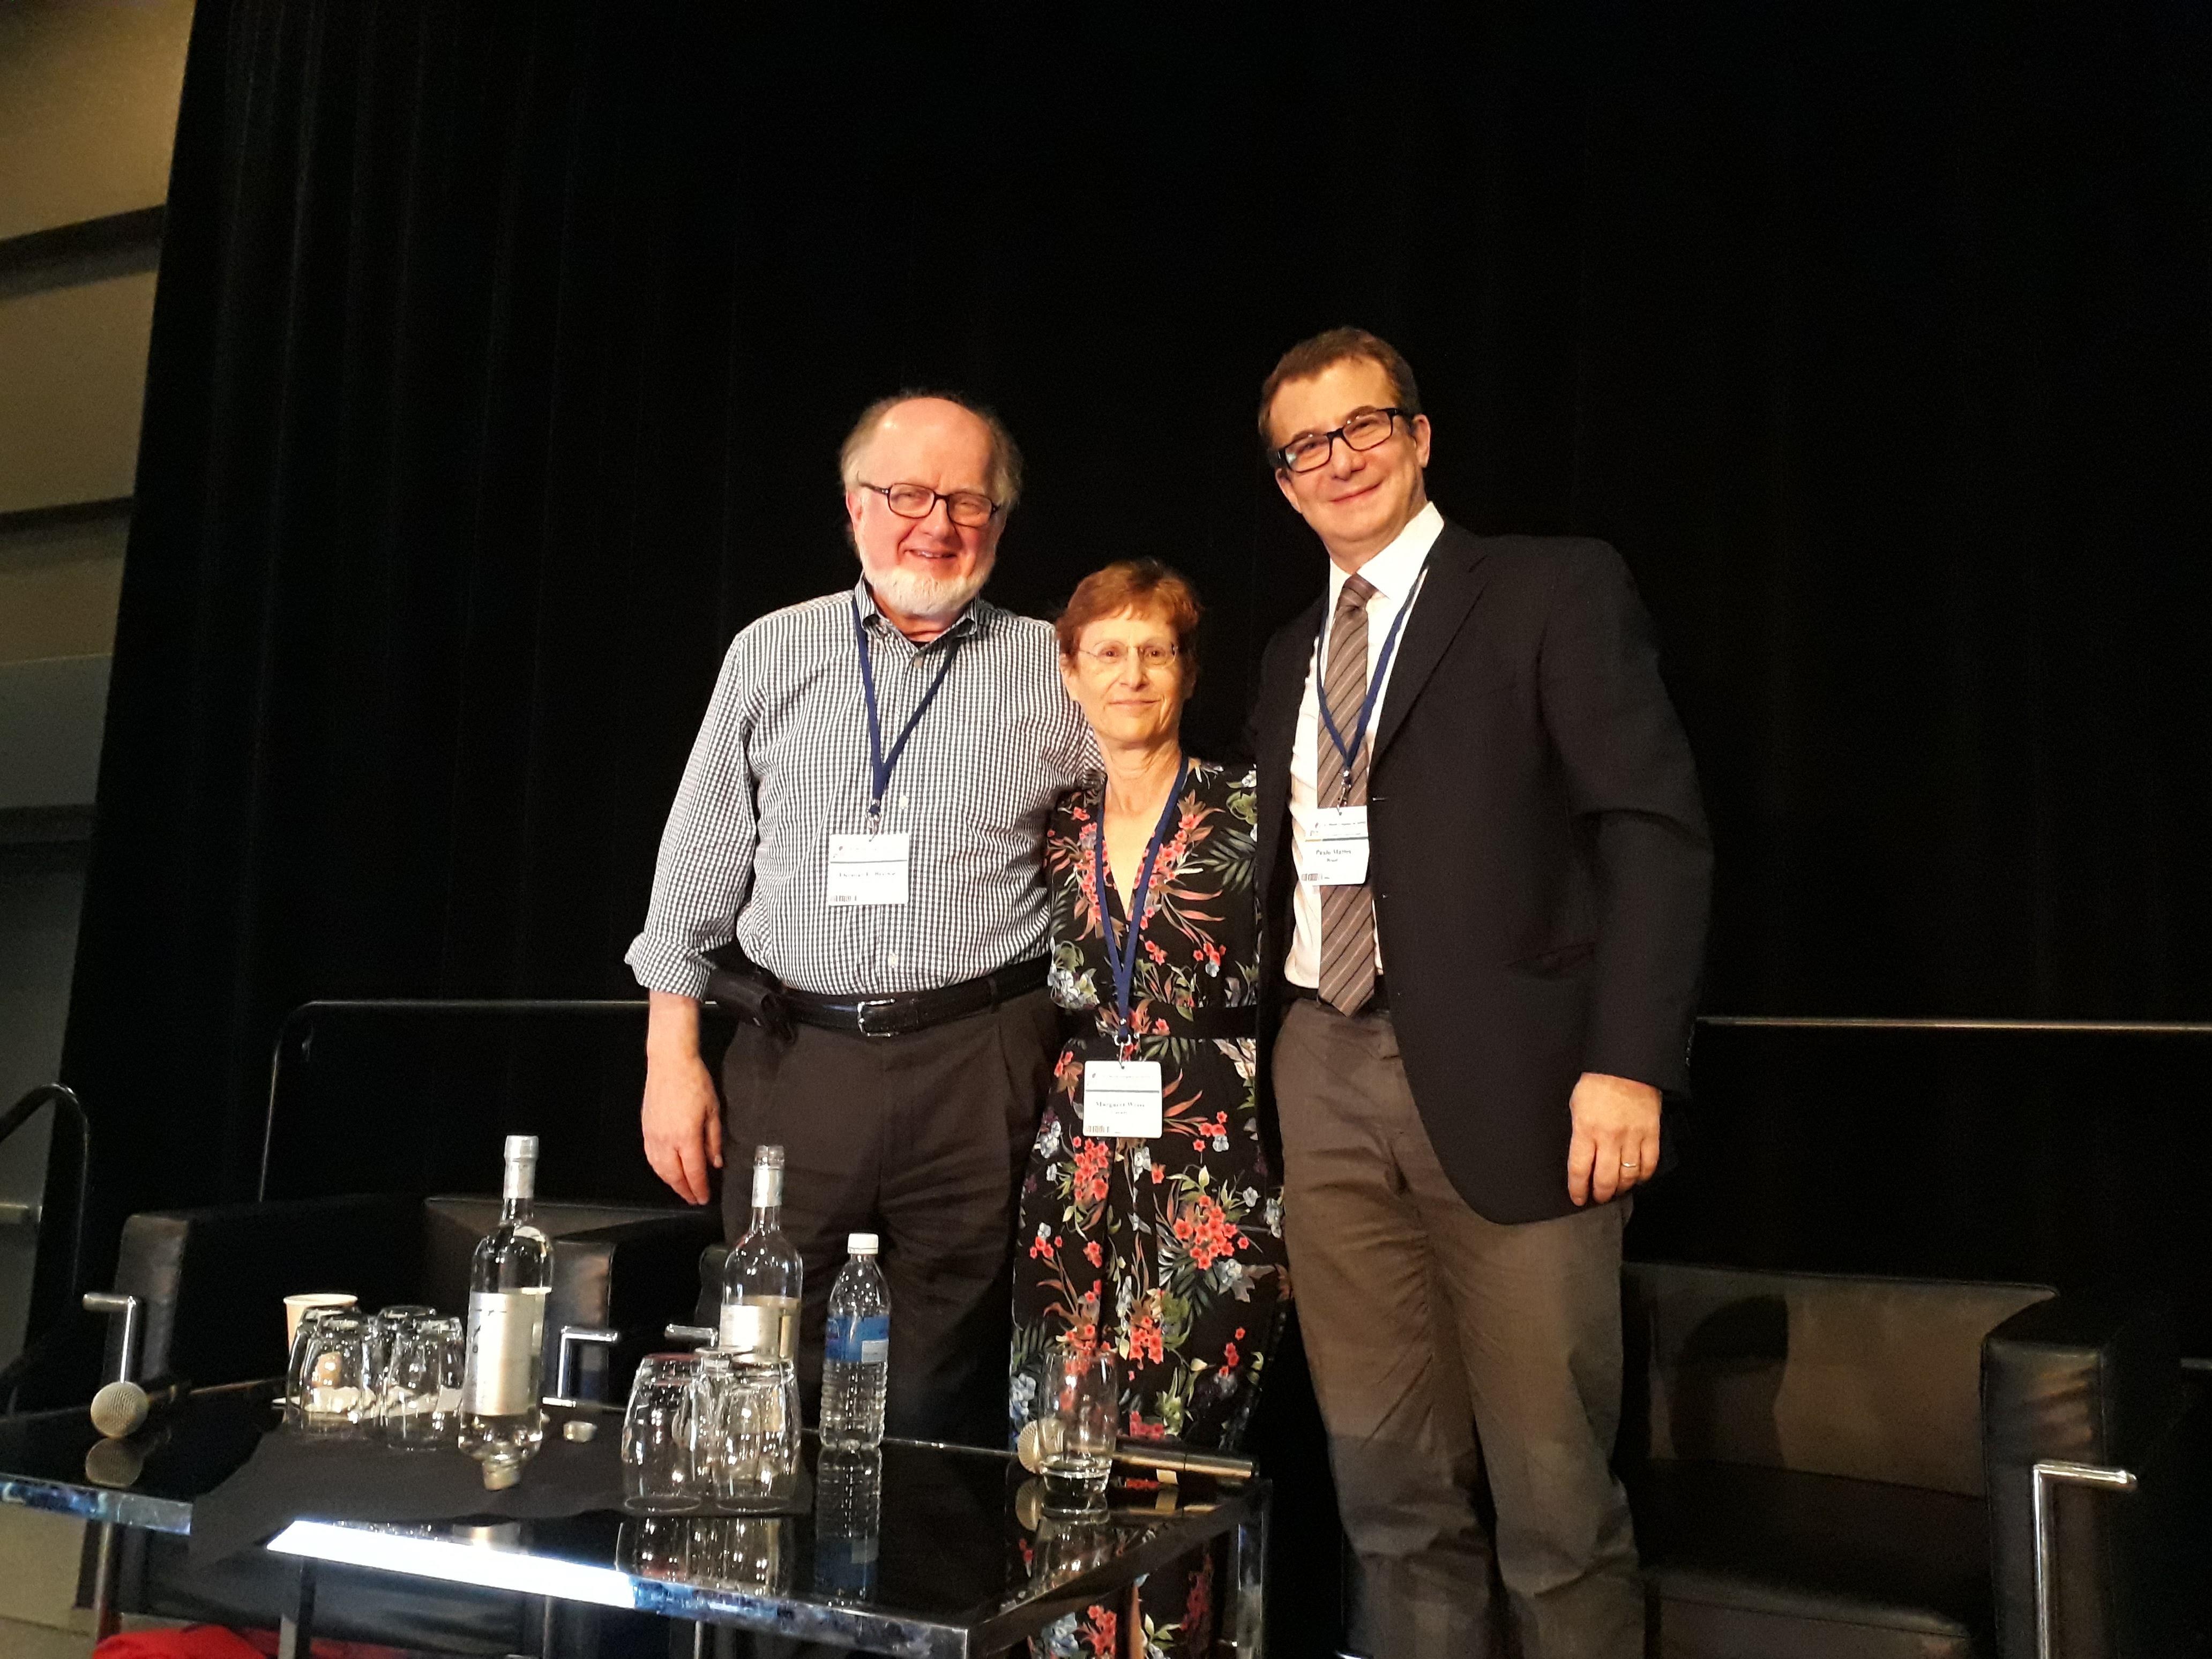 ADHD Congress Vancouver 2017